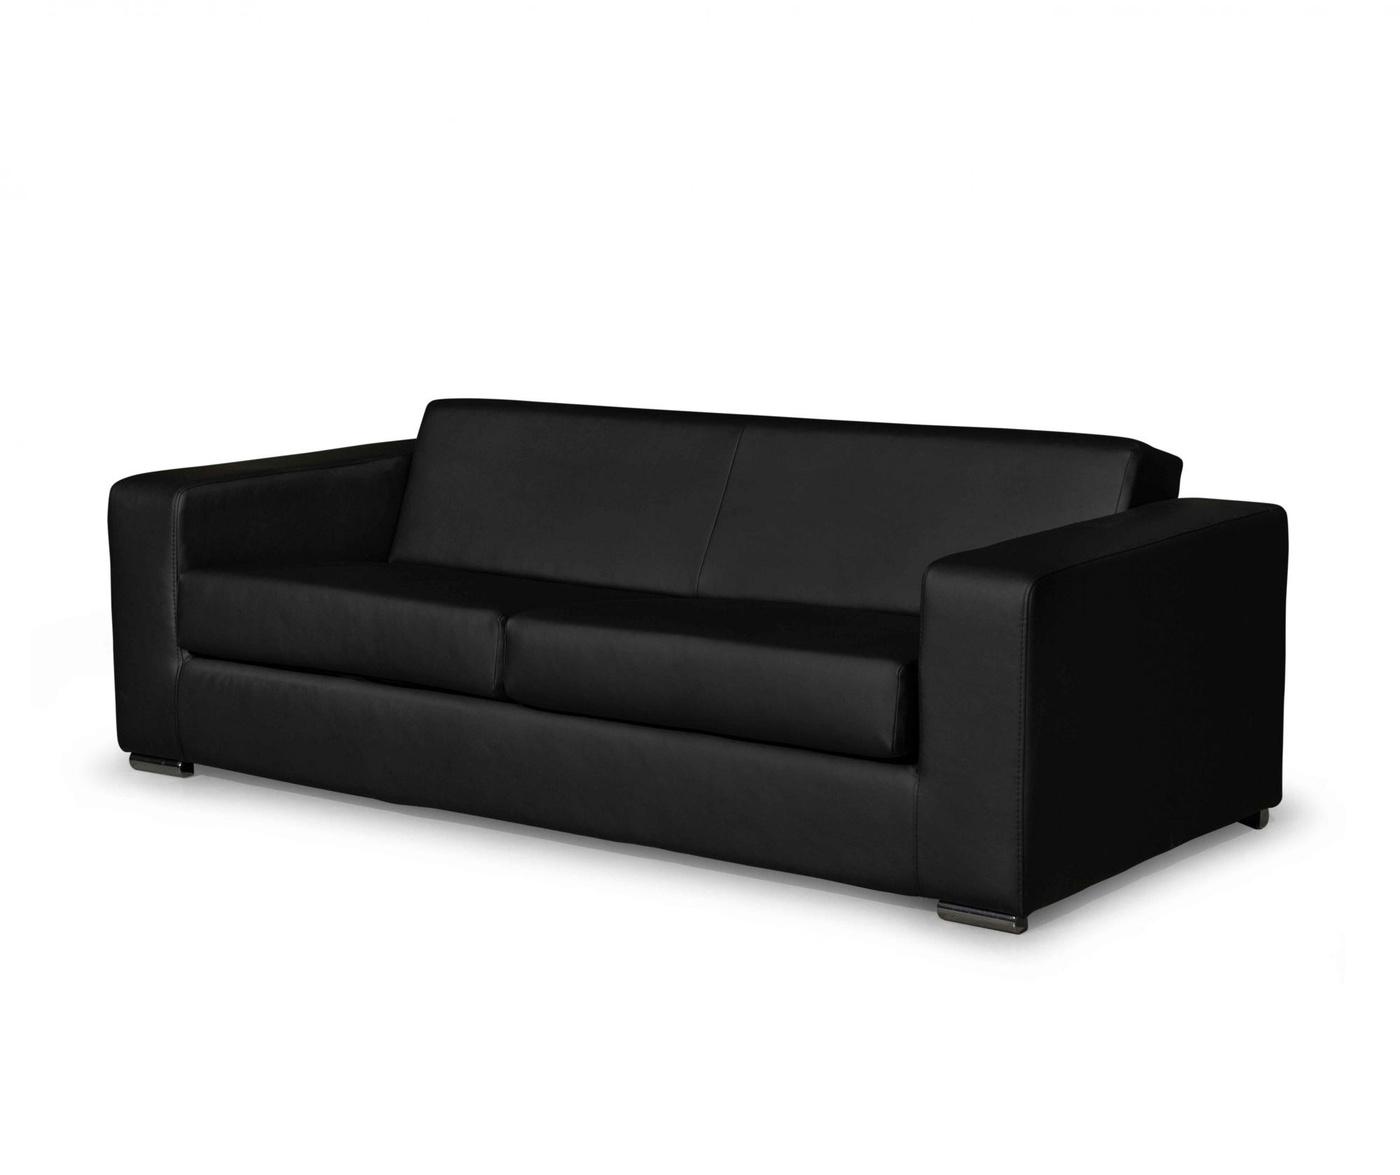 Canapea 3 locuri Ava Paloma Black